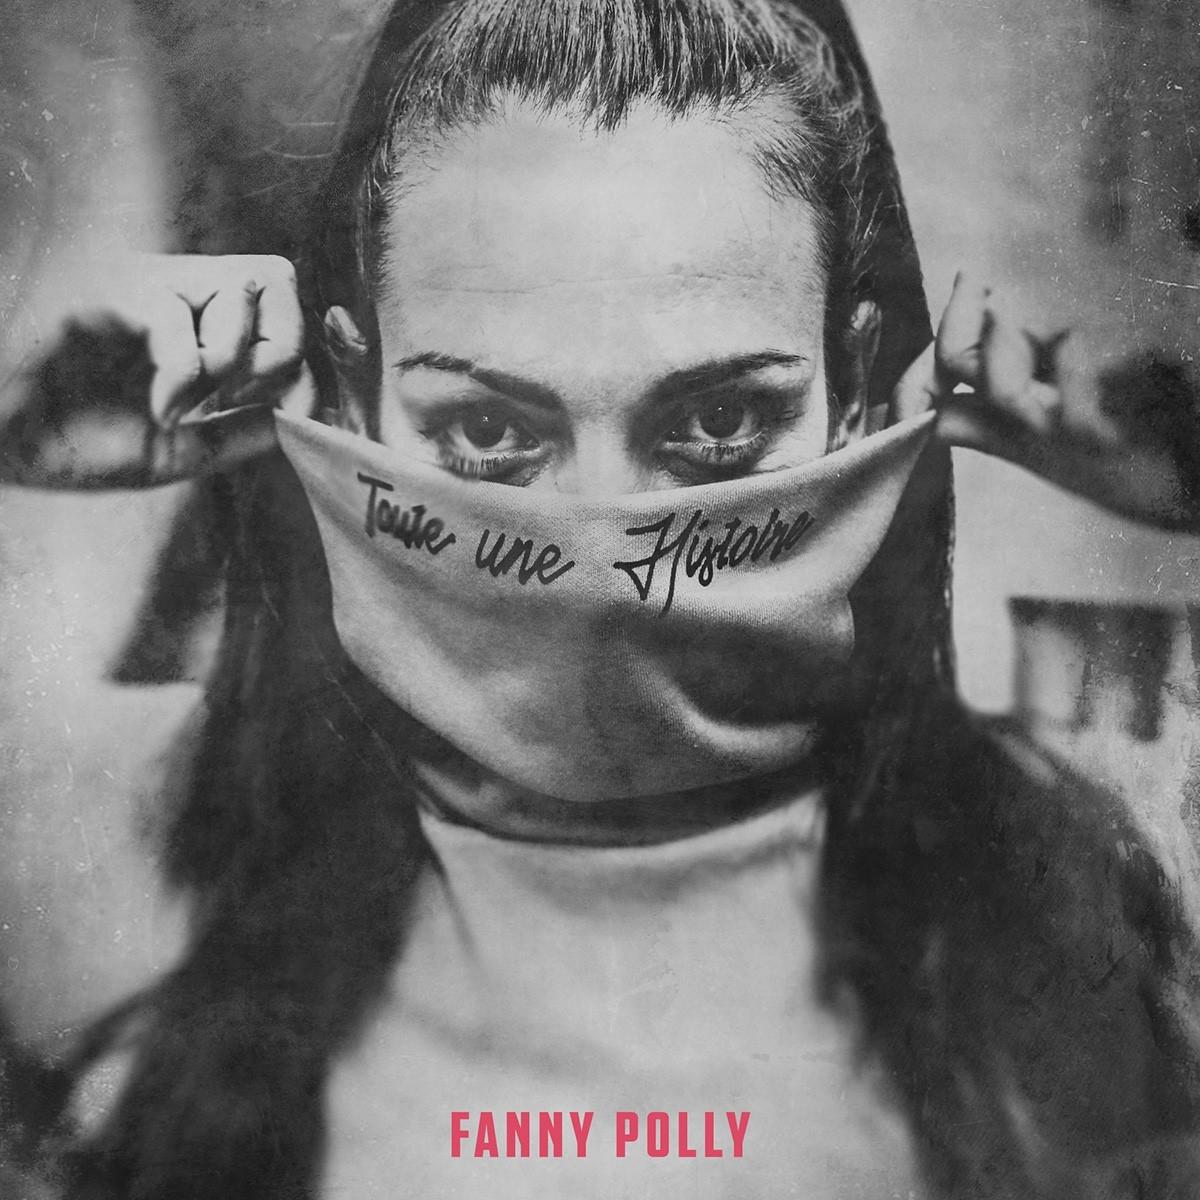 Album Cd Fanny Polly - Toute une histoire